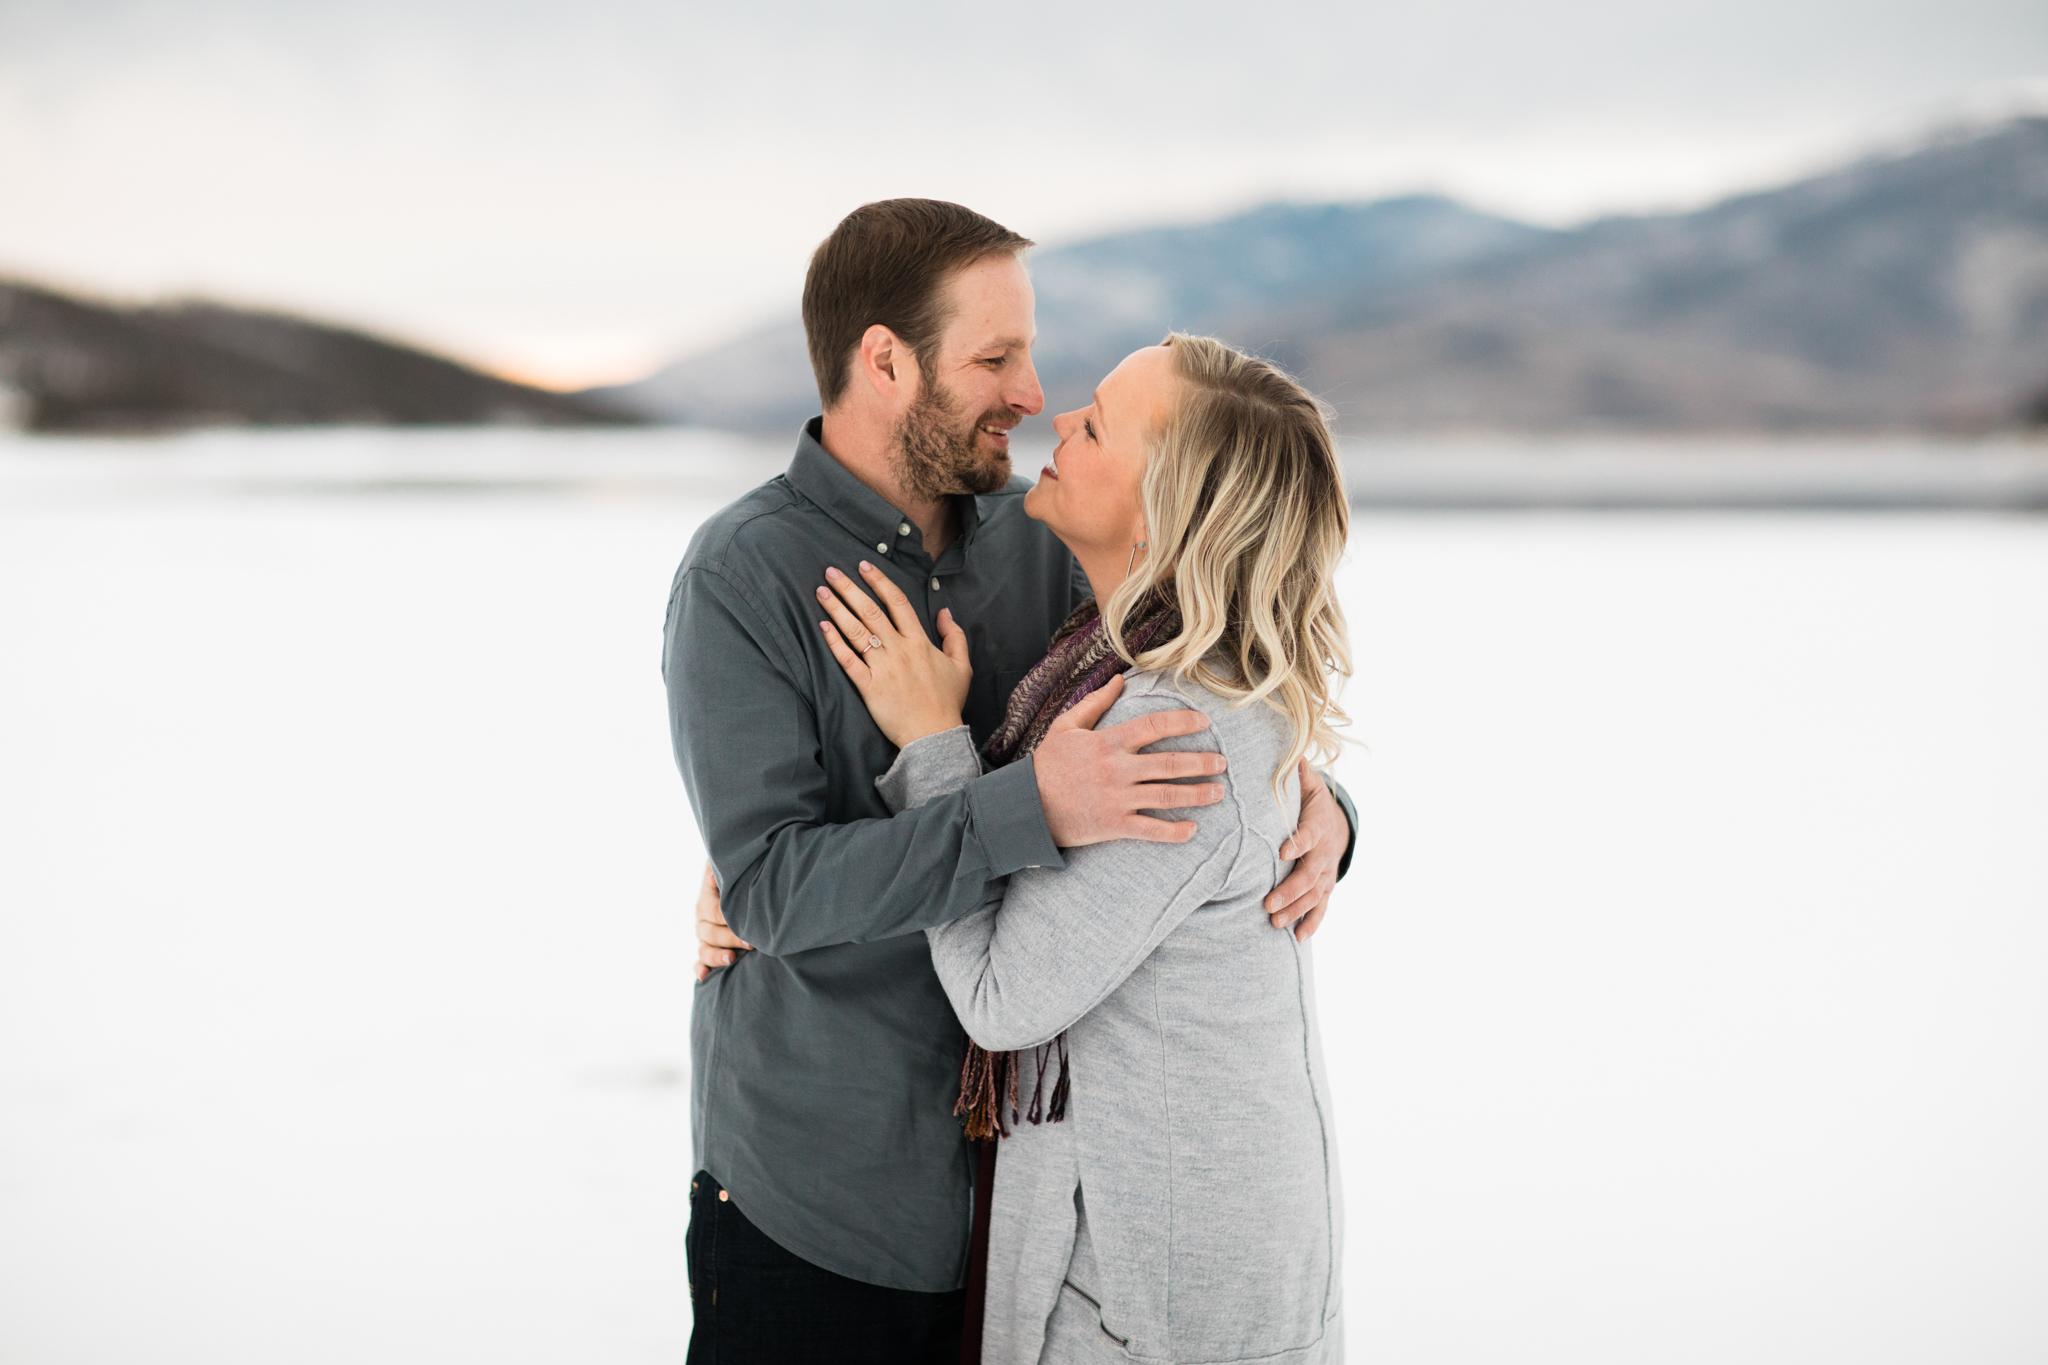 Lake Dillon Colorado Winter Engagement Session 25